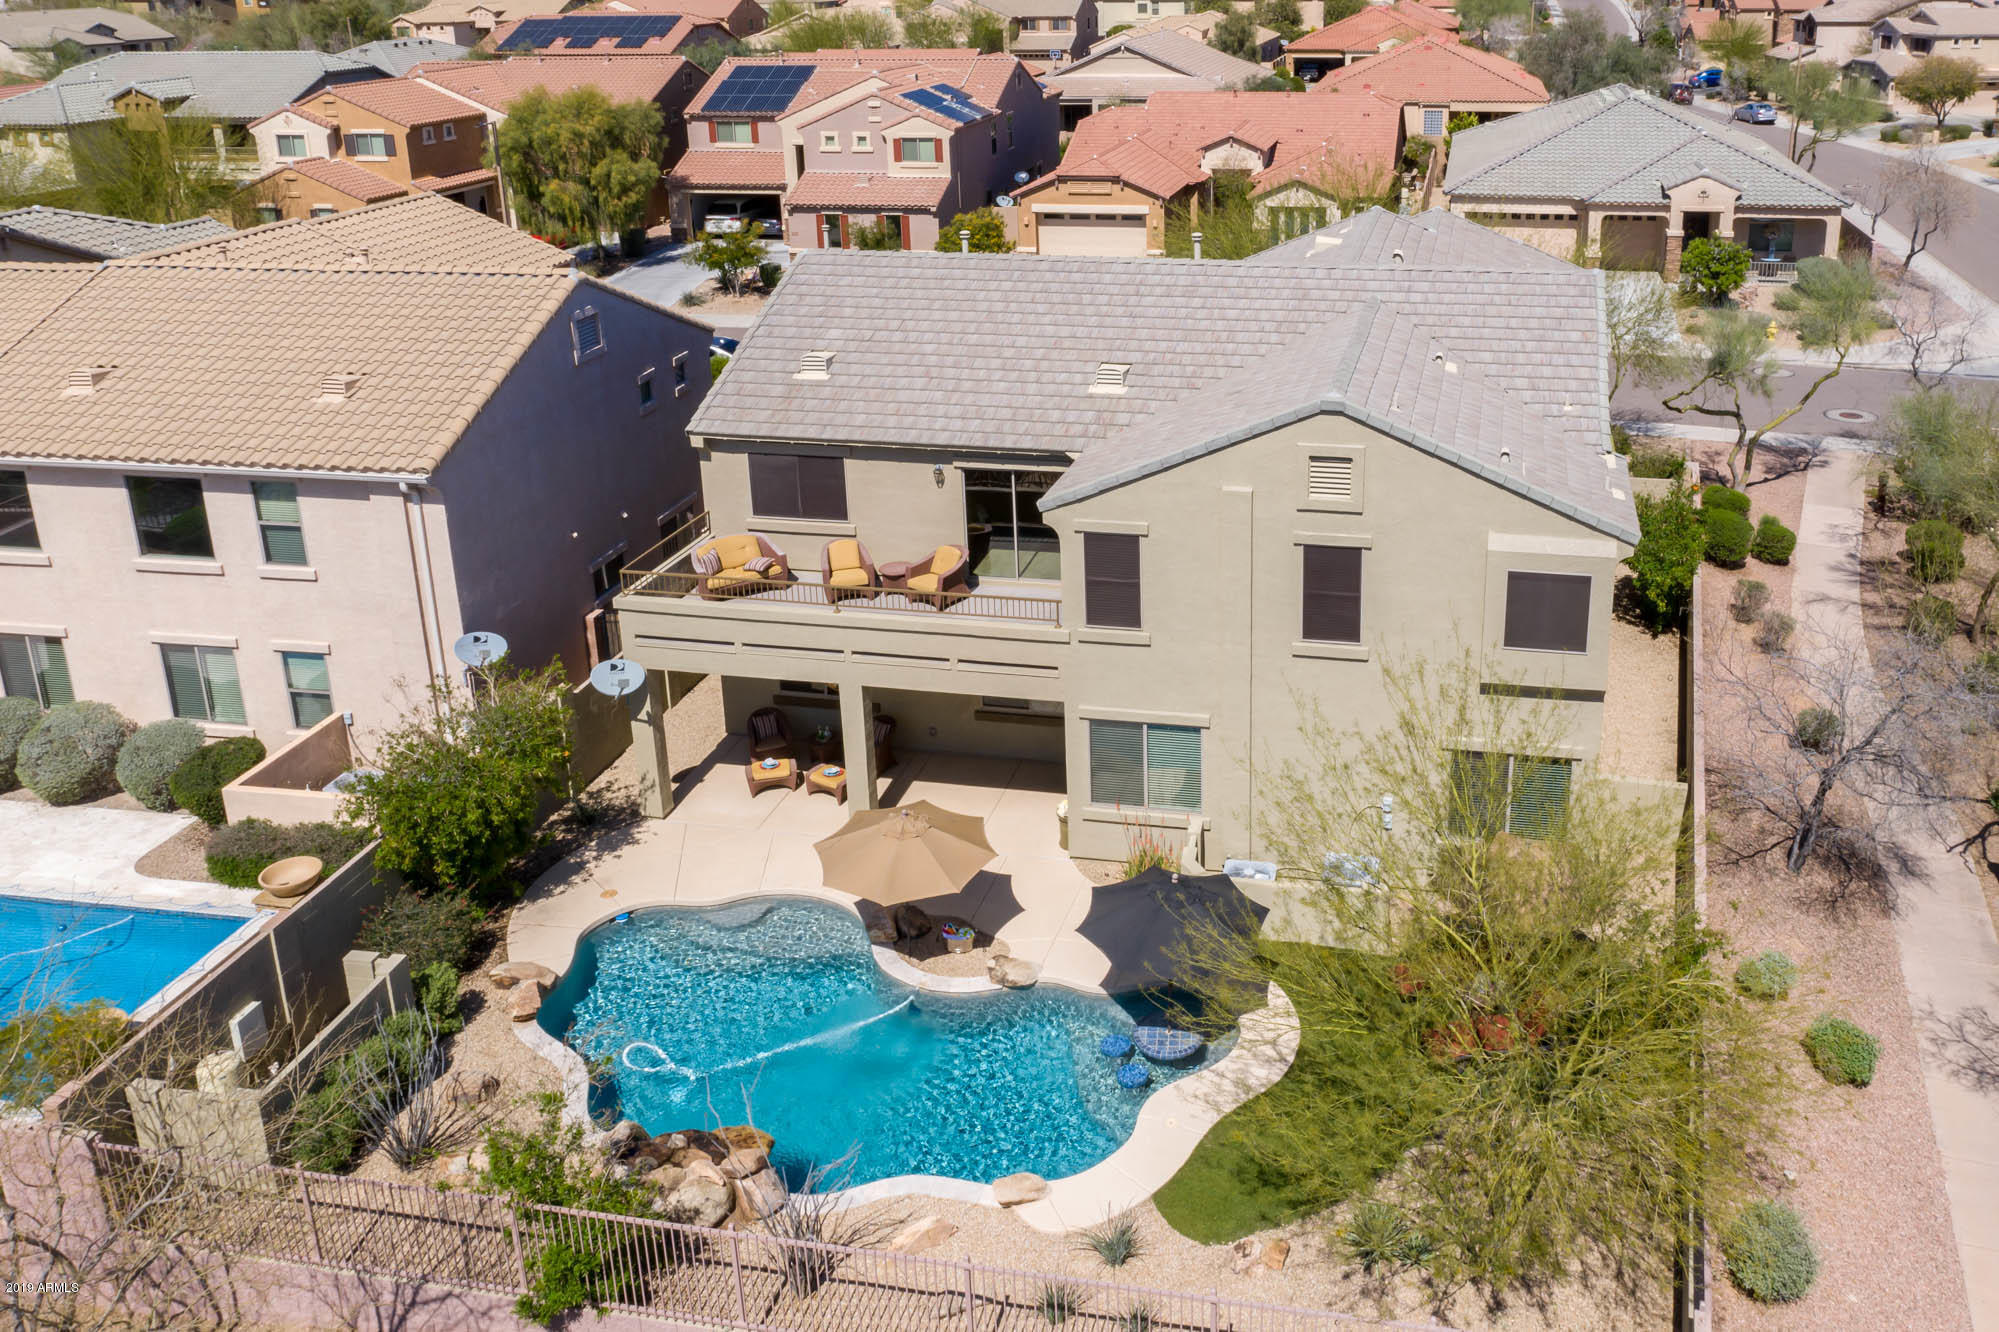 MLS 5901183 4317 E HASHKNIFE Road, Phoenix, AZ 85050 Phoenix AZ Desert Ridge